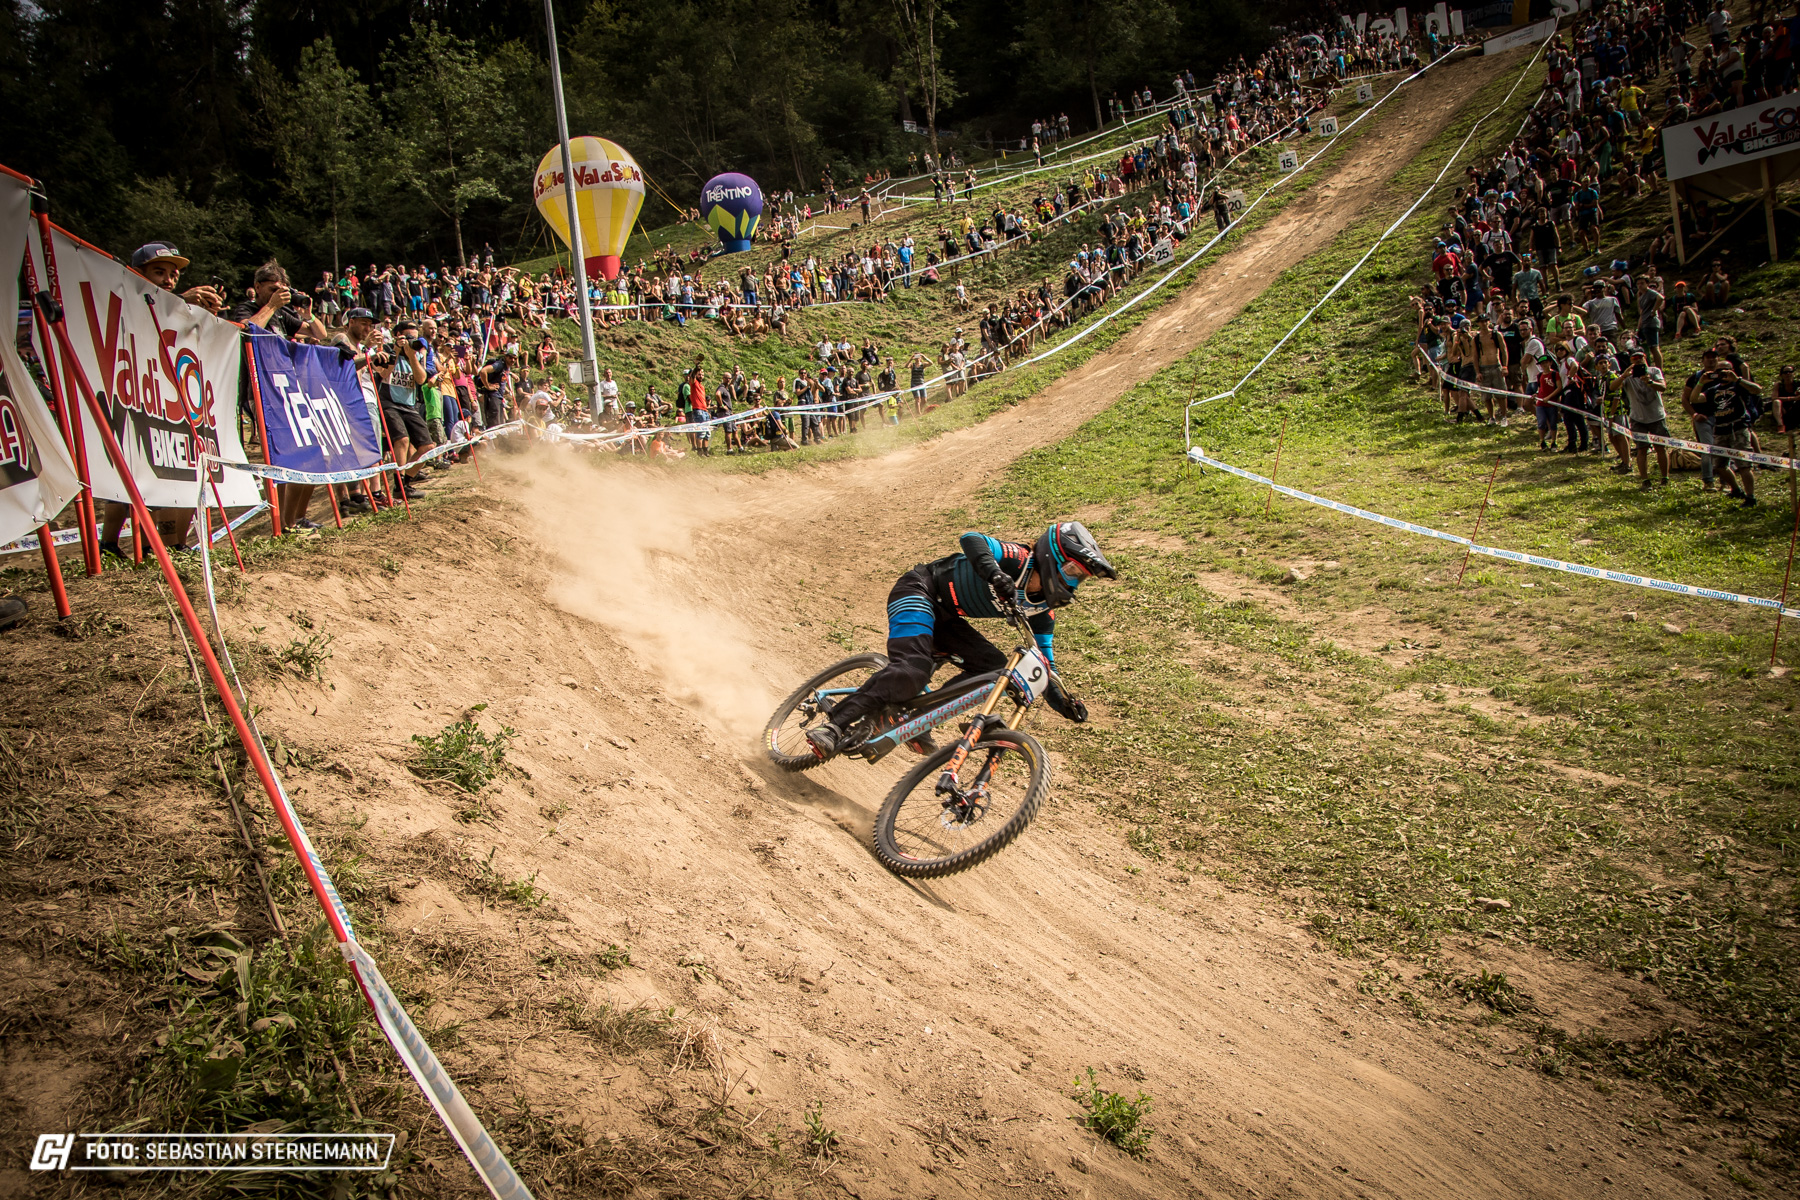 Saturday Val di Sole131 Cycleholix